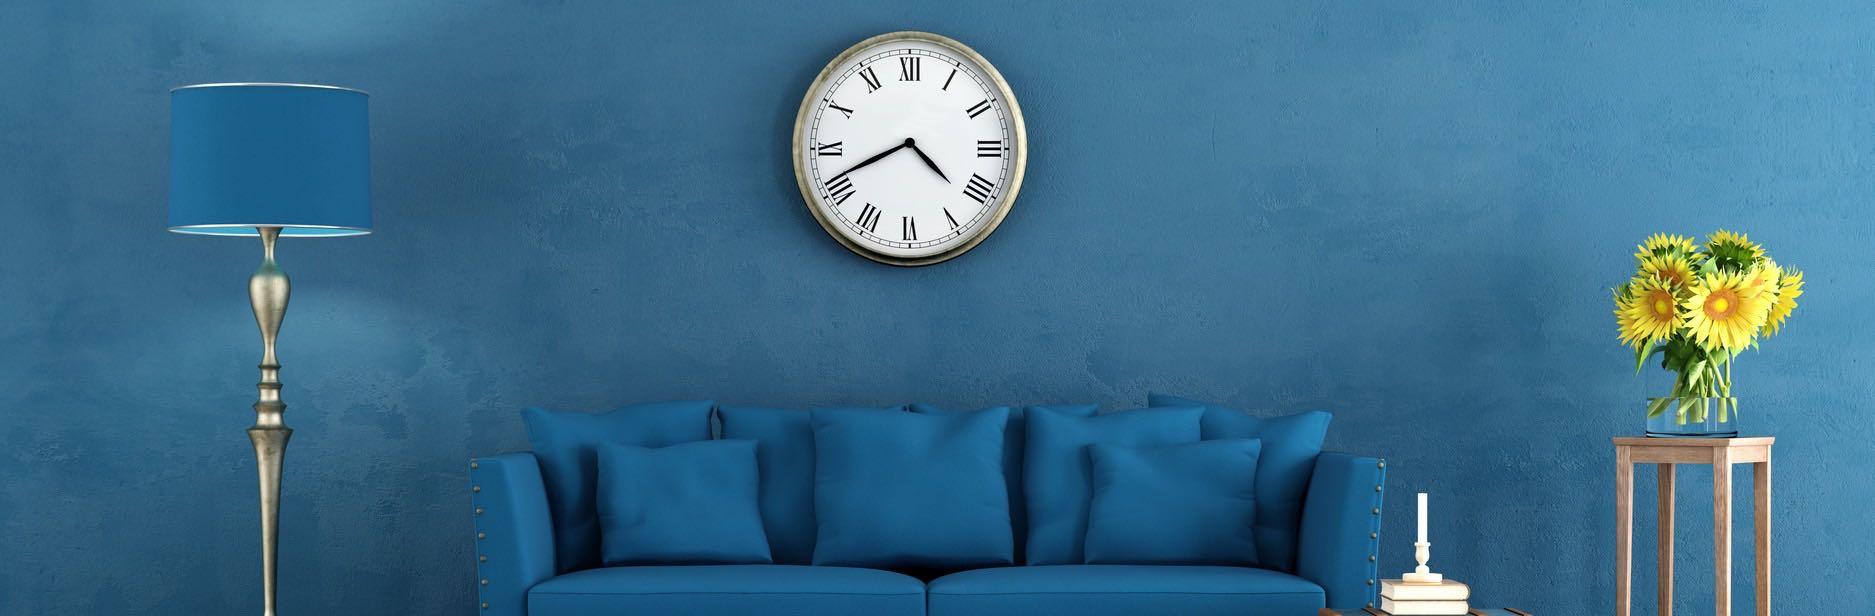 wanduhren in allen varianten wanduhren shop24. Black Bedroom Furniture Sets. Home Design Ideas